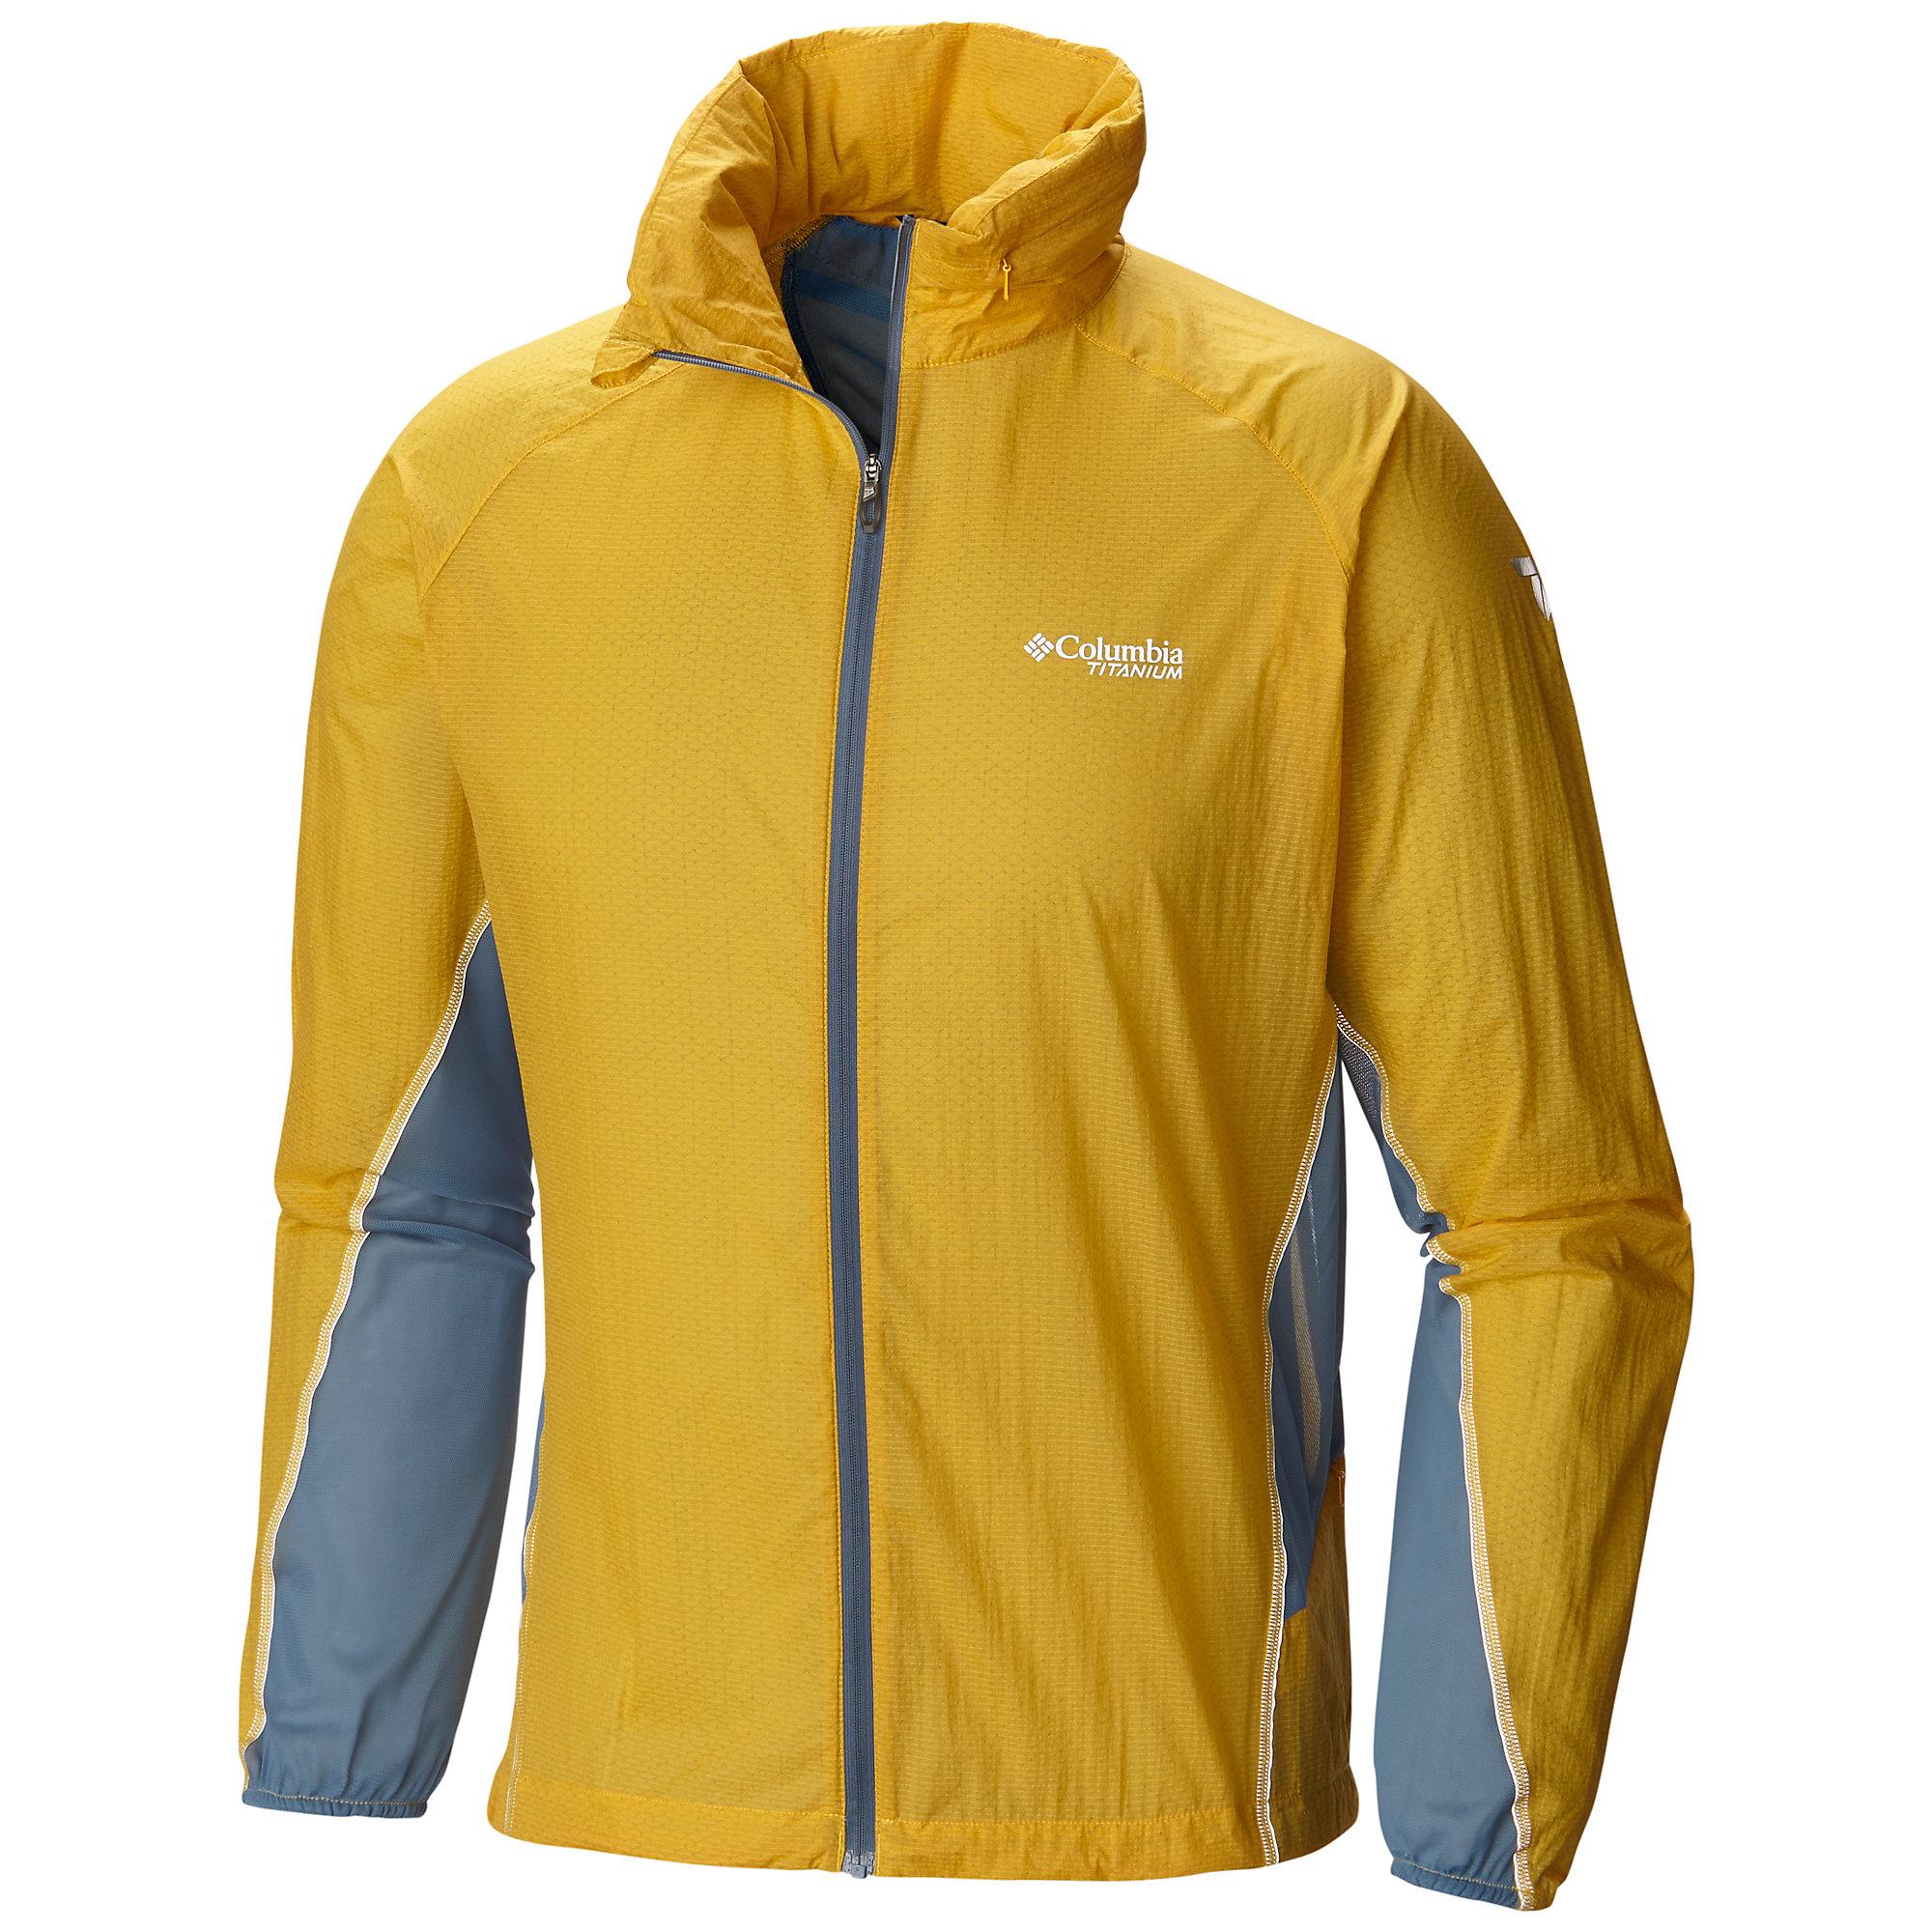 Columbia Chioni Jacket